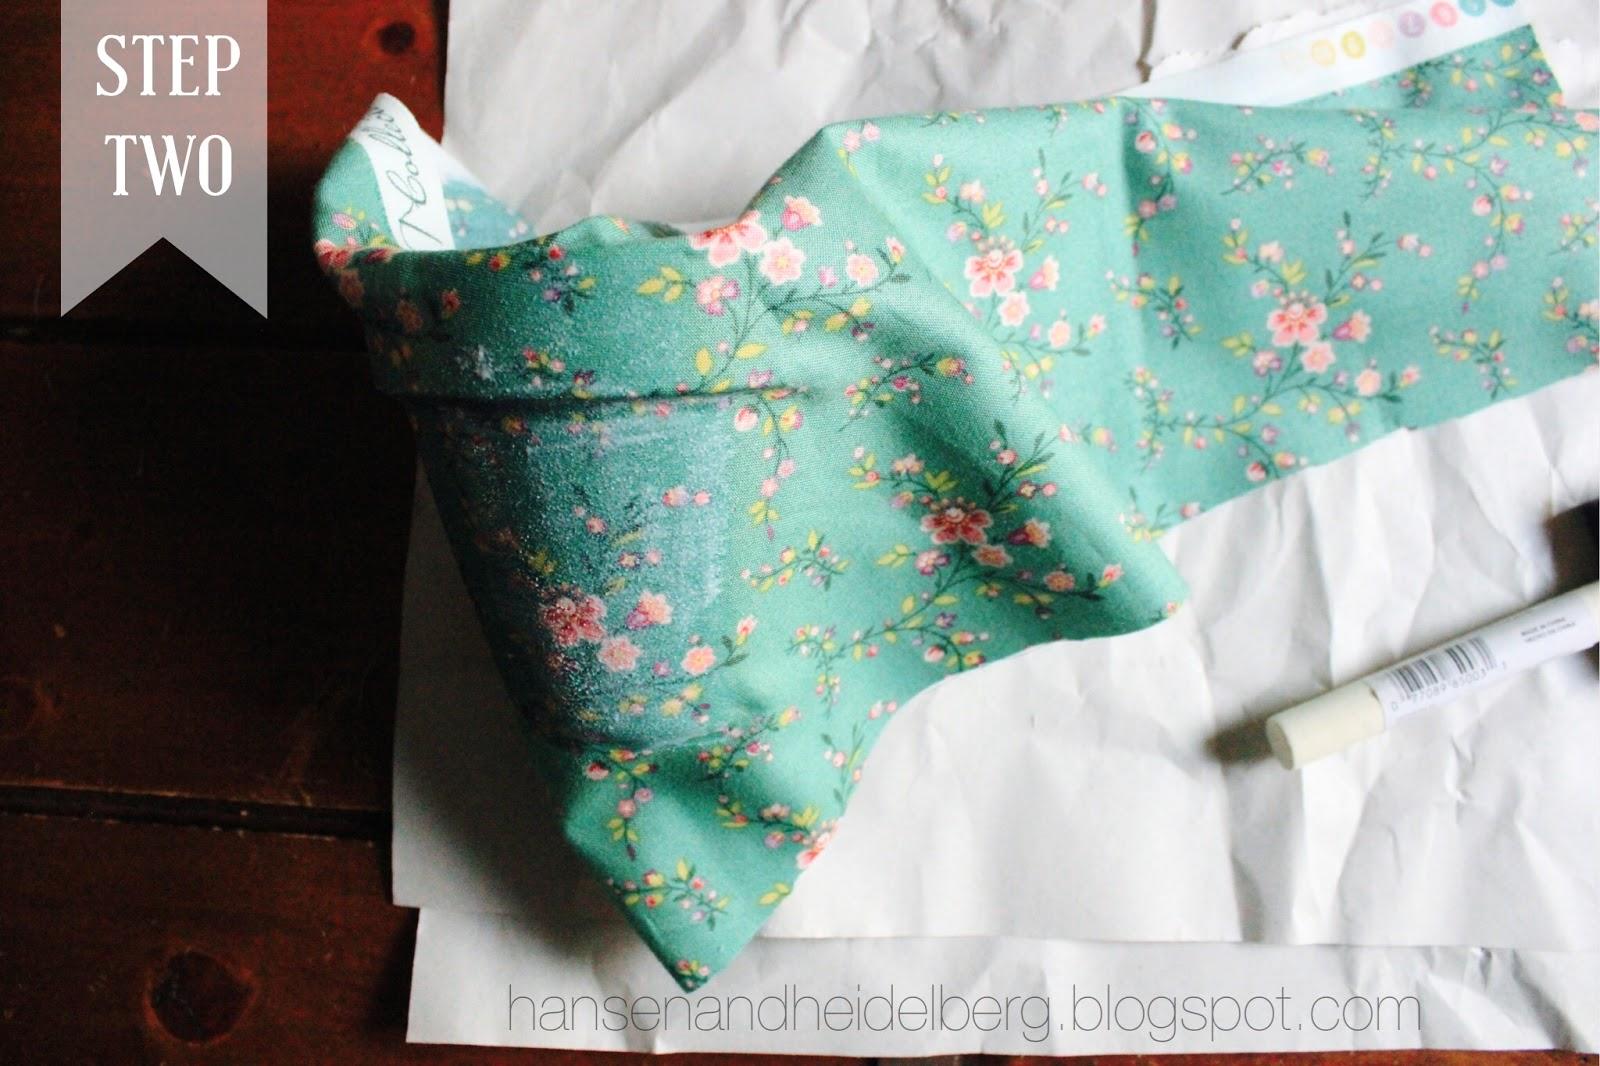 diy garden crafts, diy fabric pots, fabric pots, diy gifts